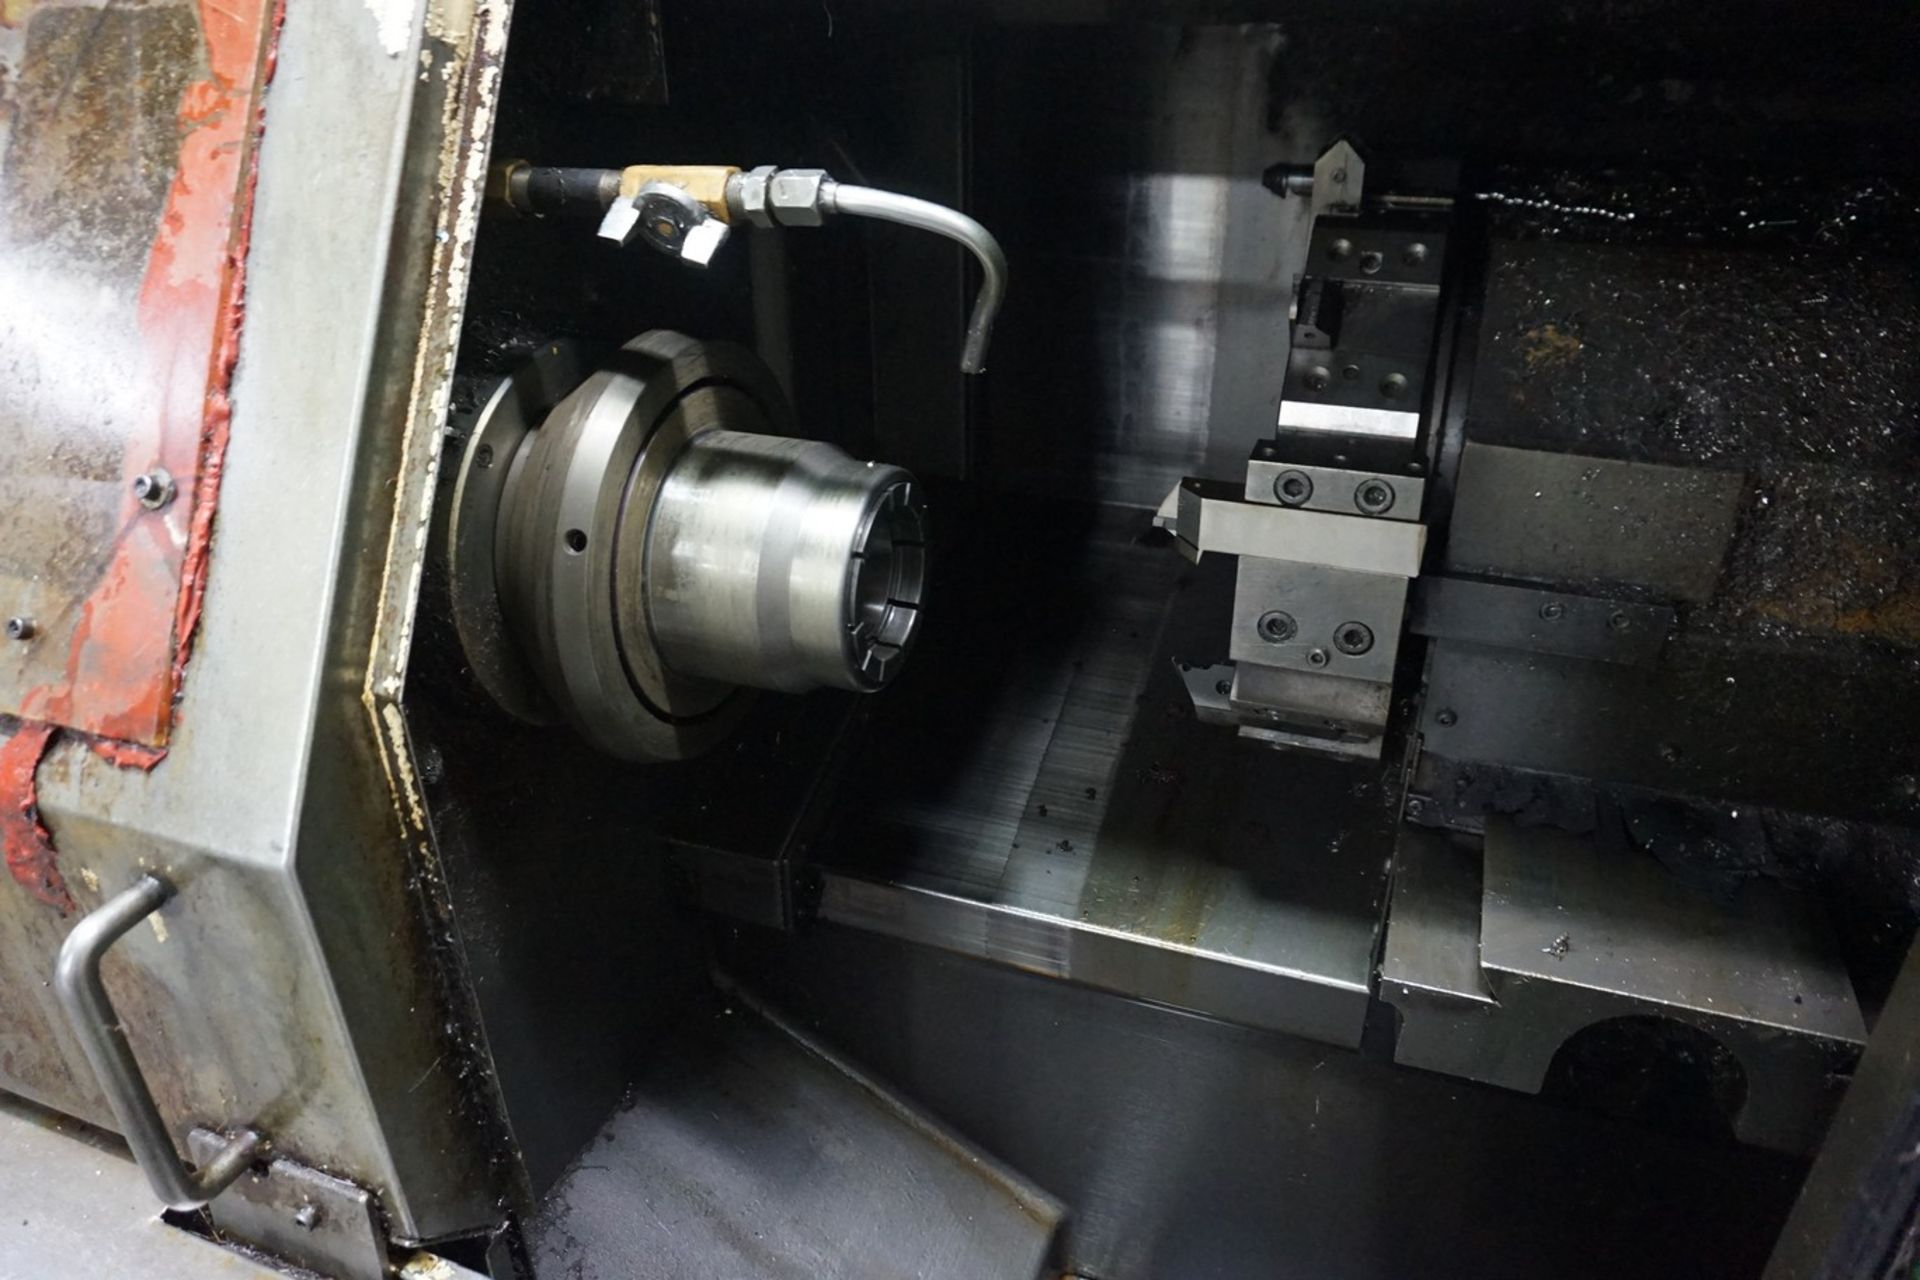 Takamatsu Model X10 CNC Lathe 200/220V c/w Chip Conveyor, Transformer - Image 3 of 6